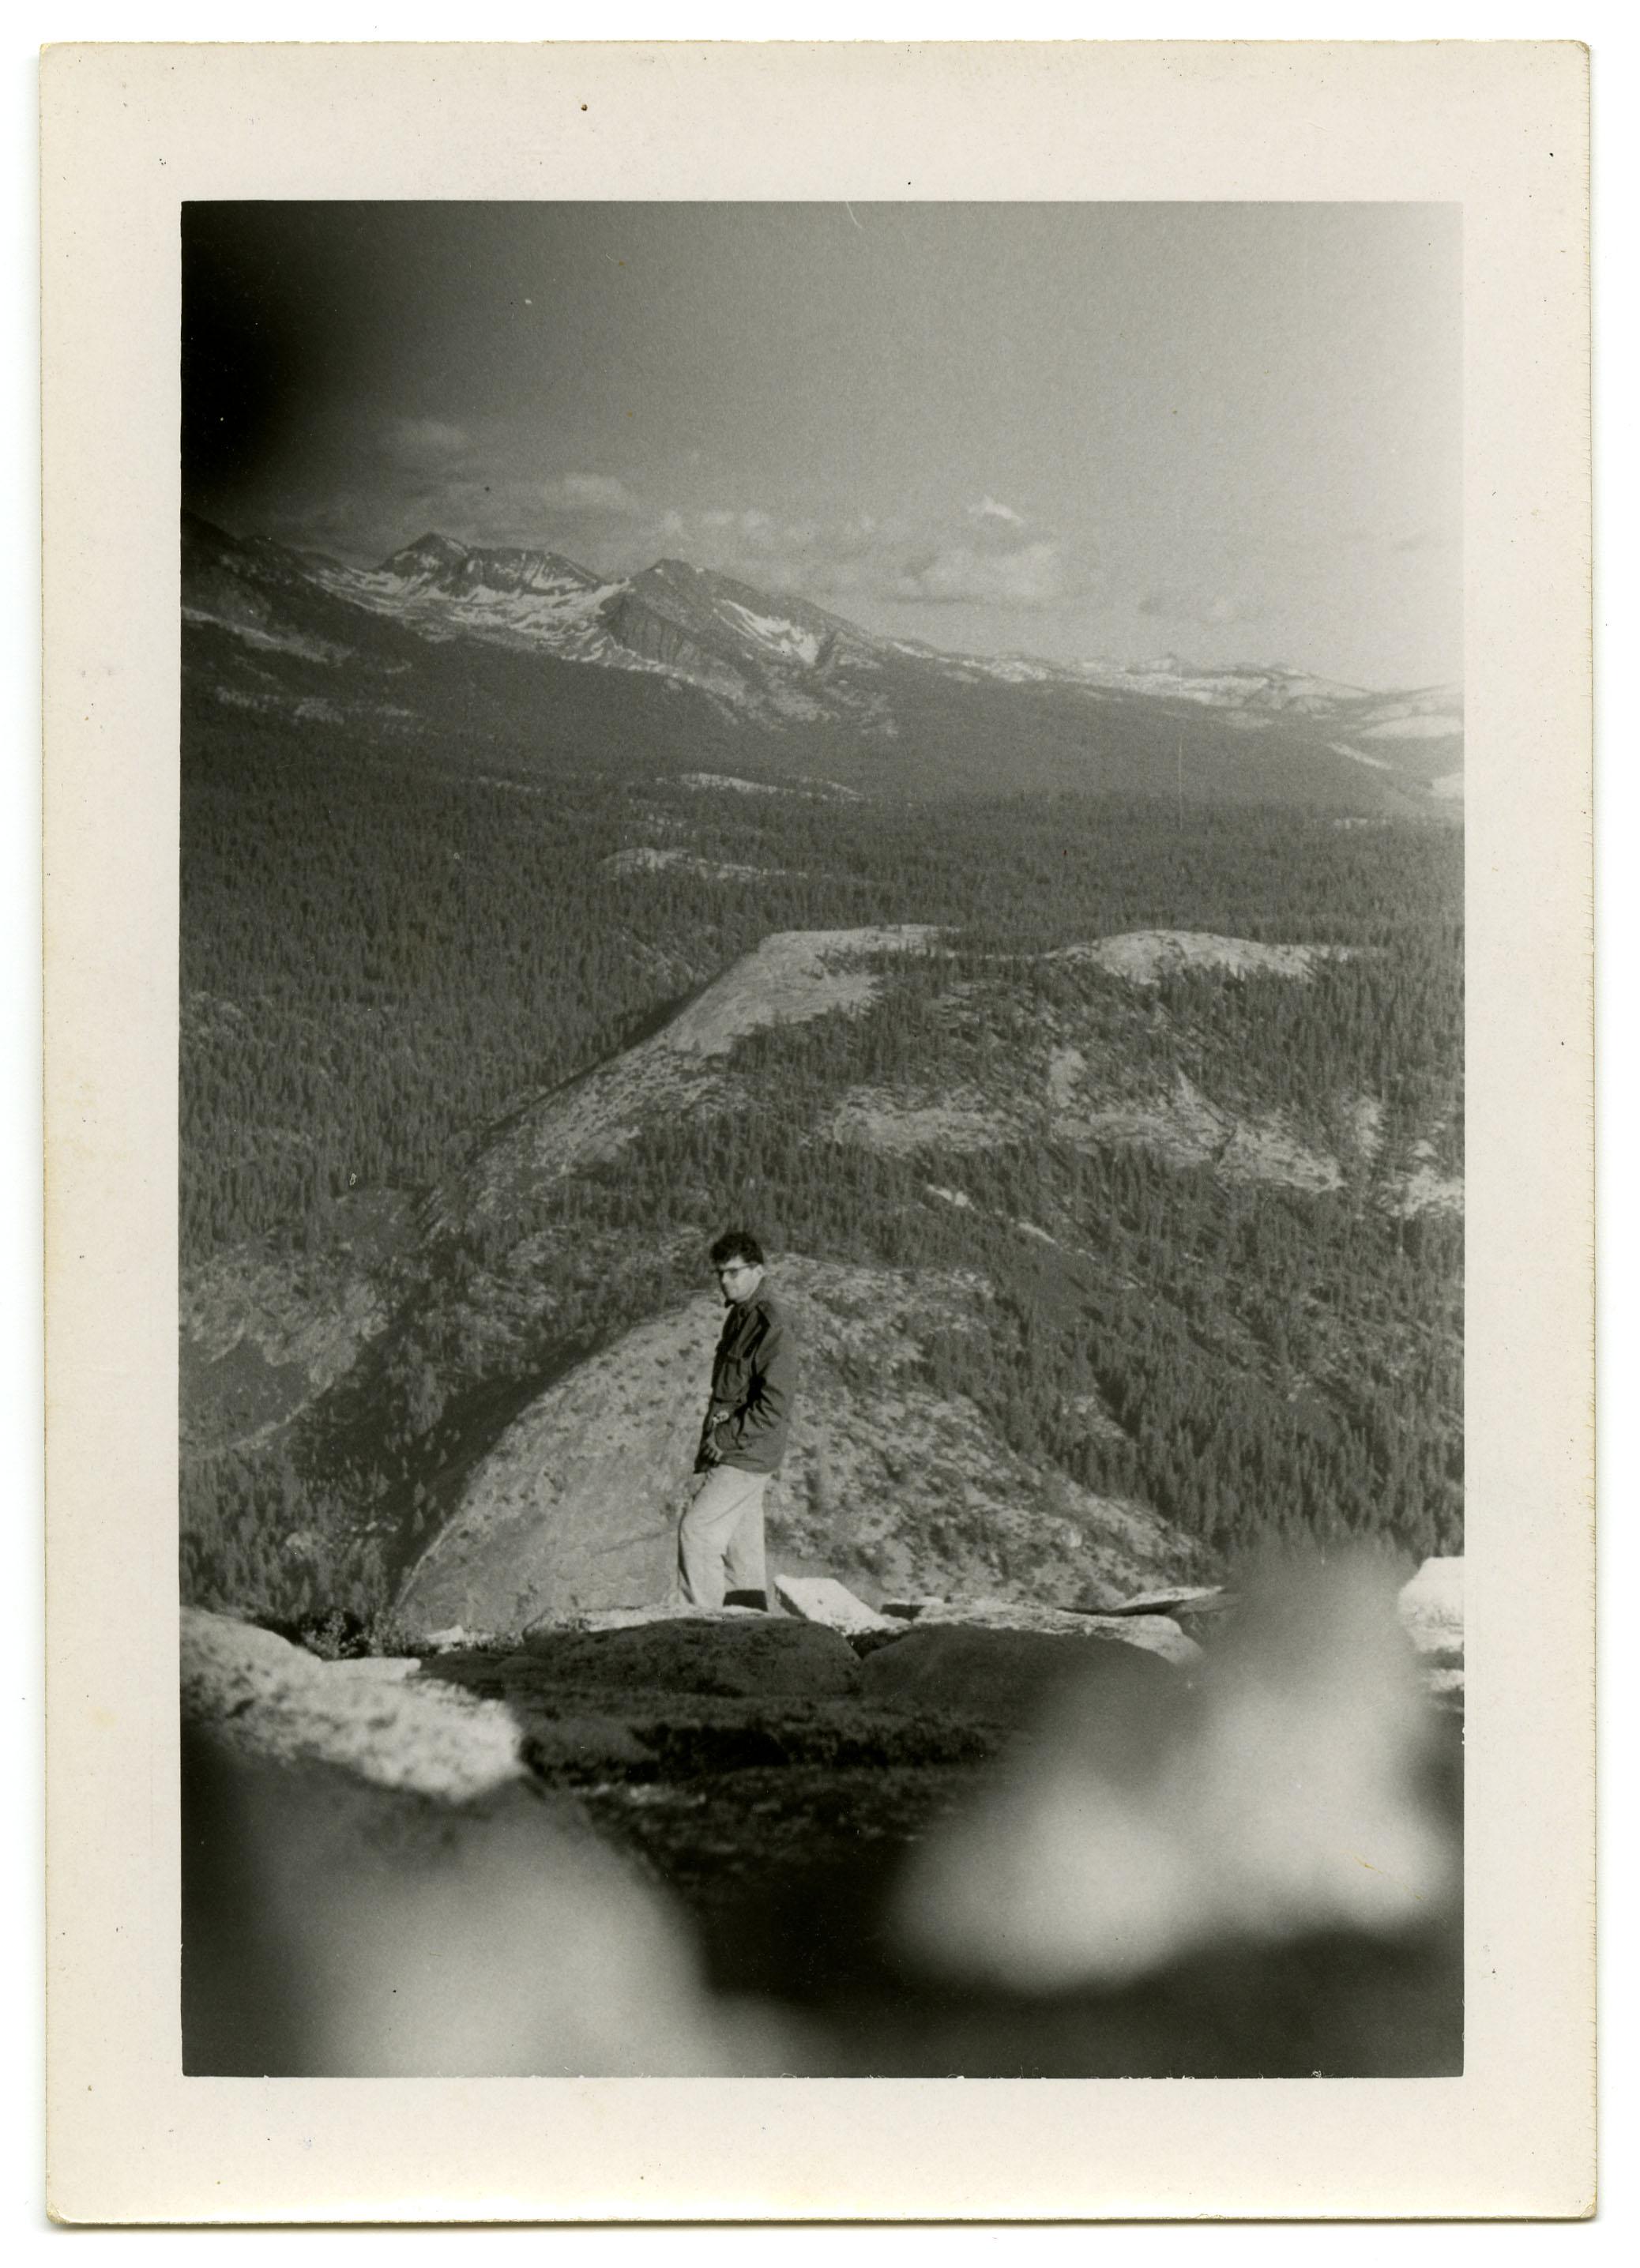 Allen Ginsberg and Peter Orlovsky. [Ginsberg and Orlovsky at Yosemite], 1956. (1)